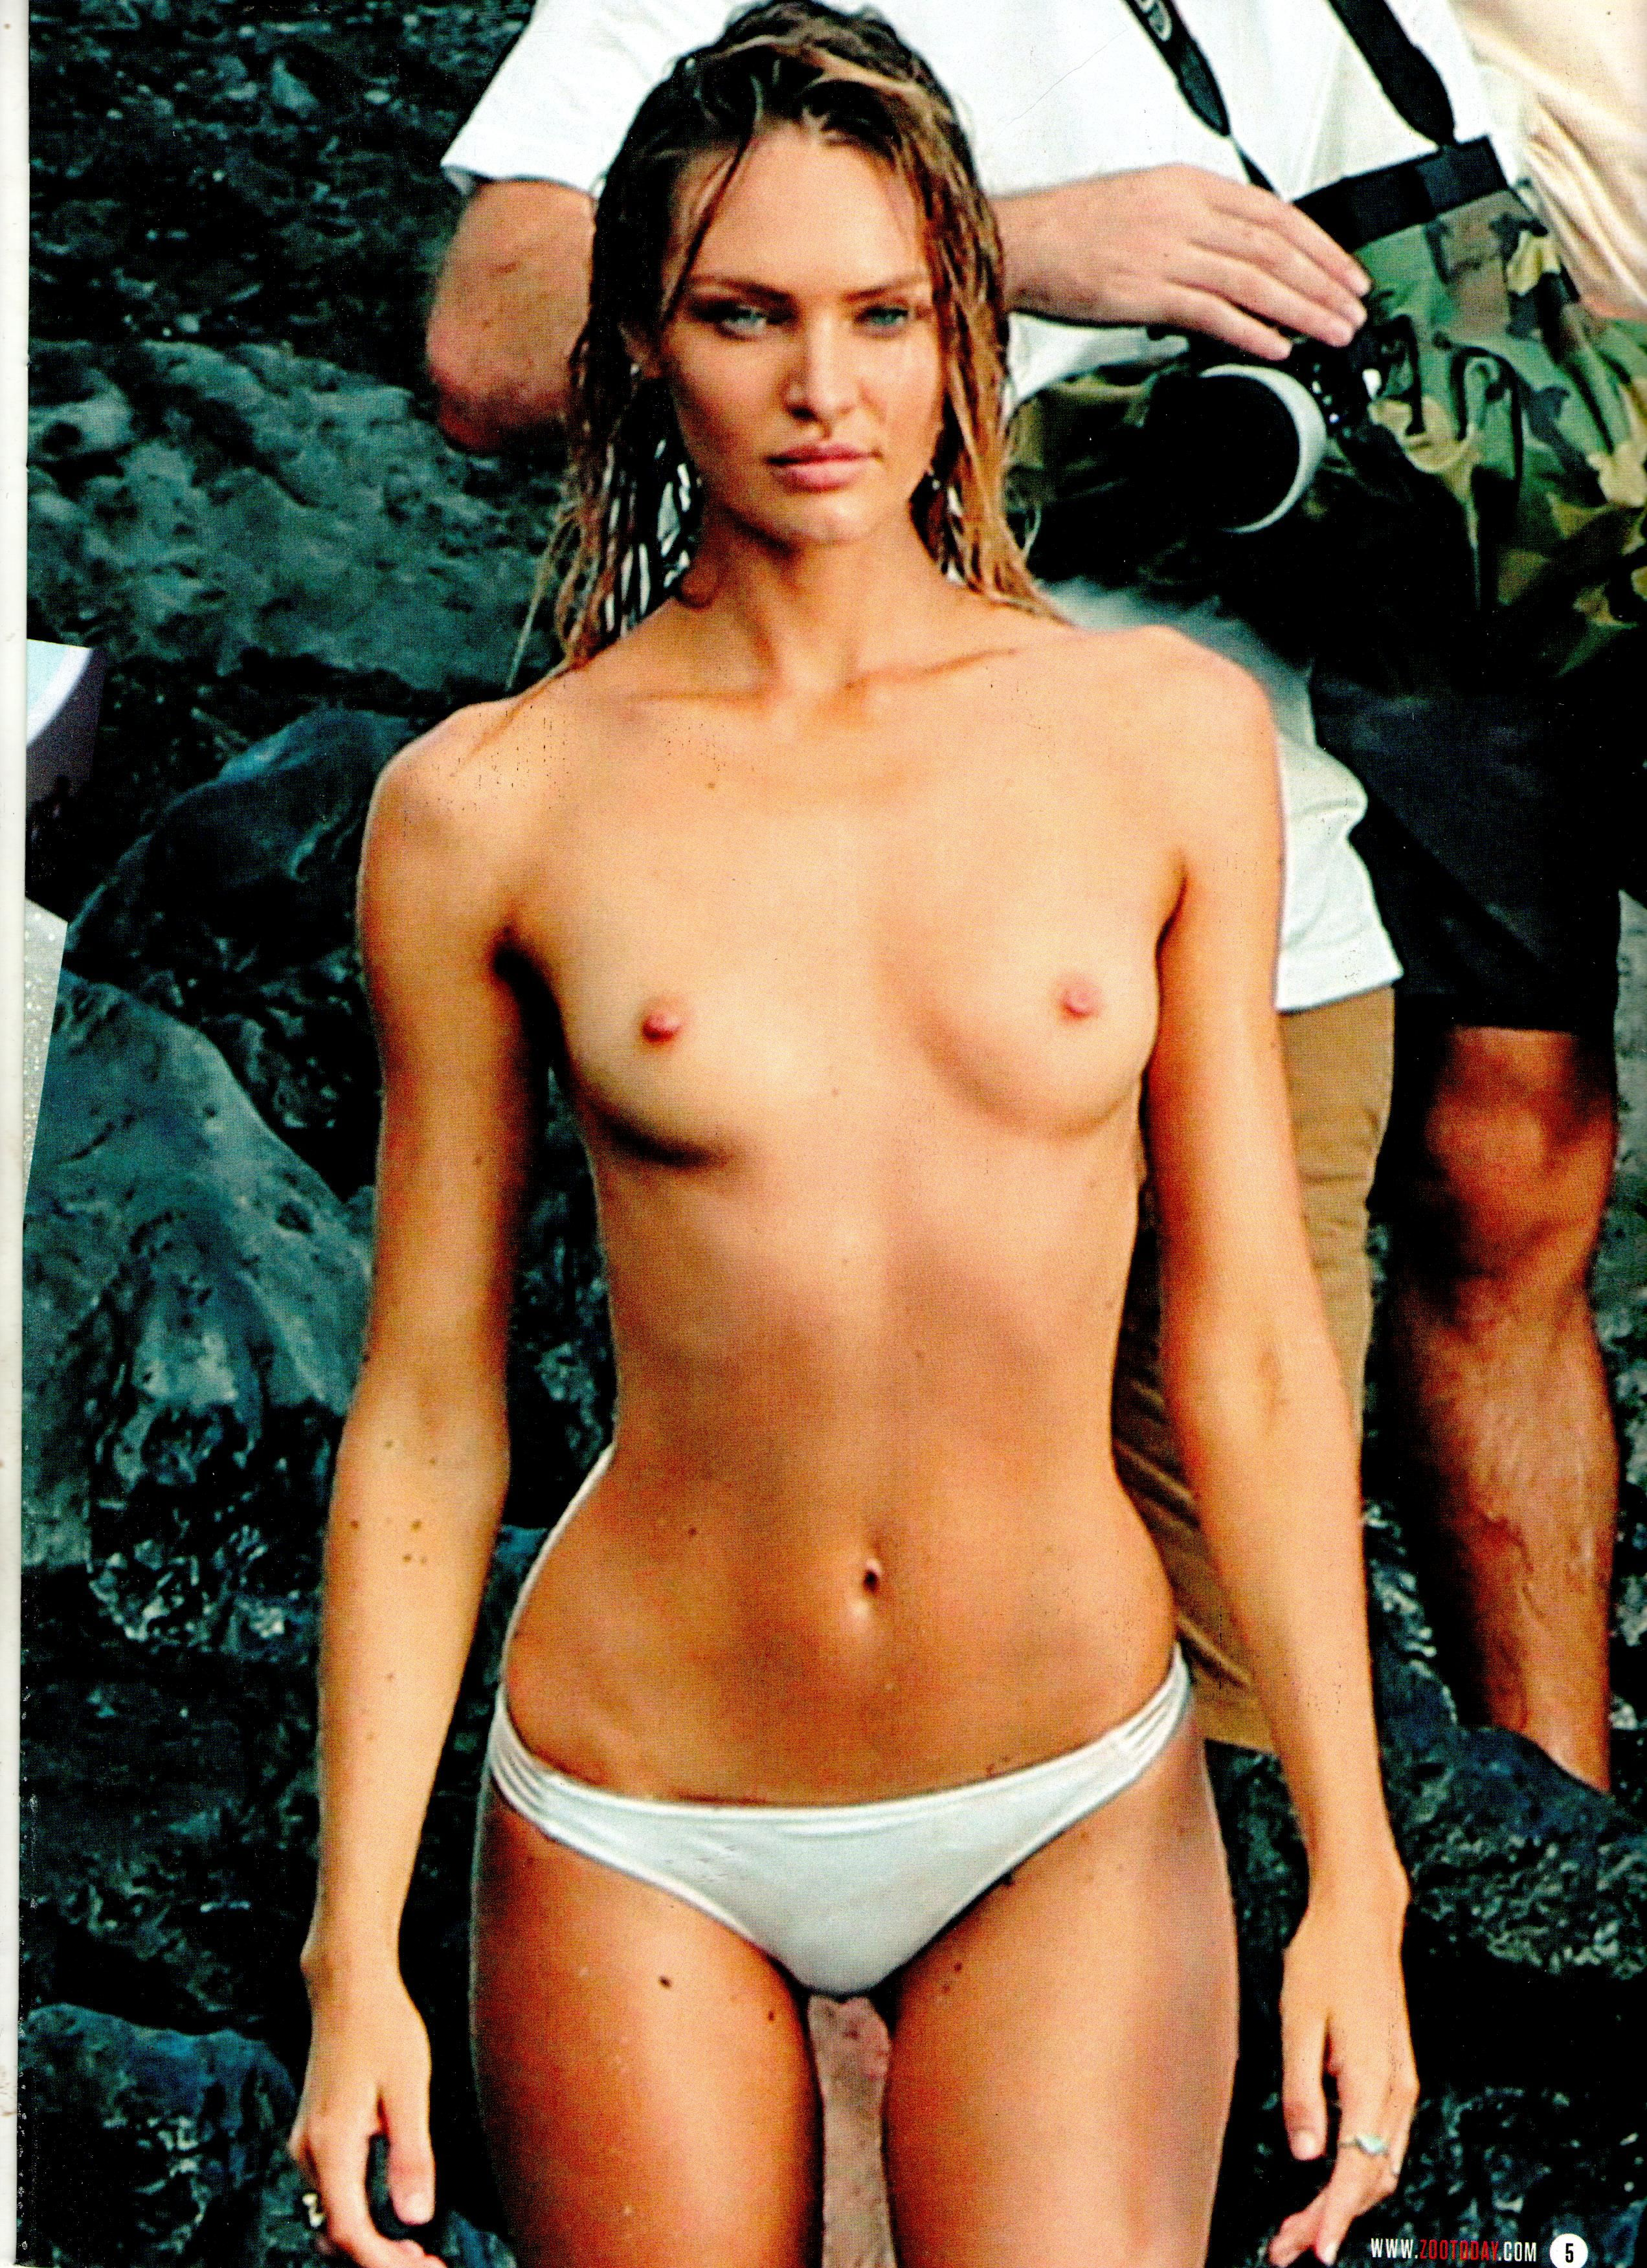 Gary gross little women nude